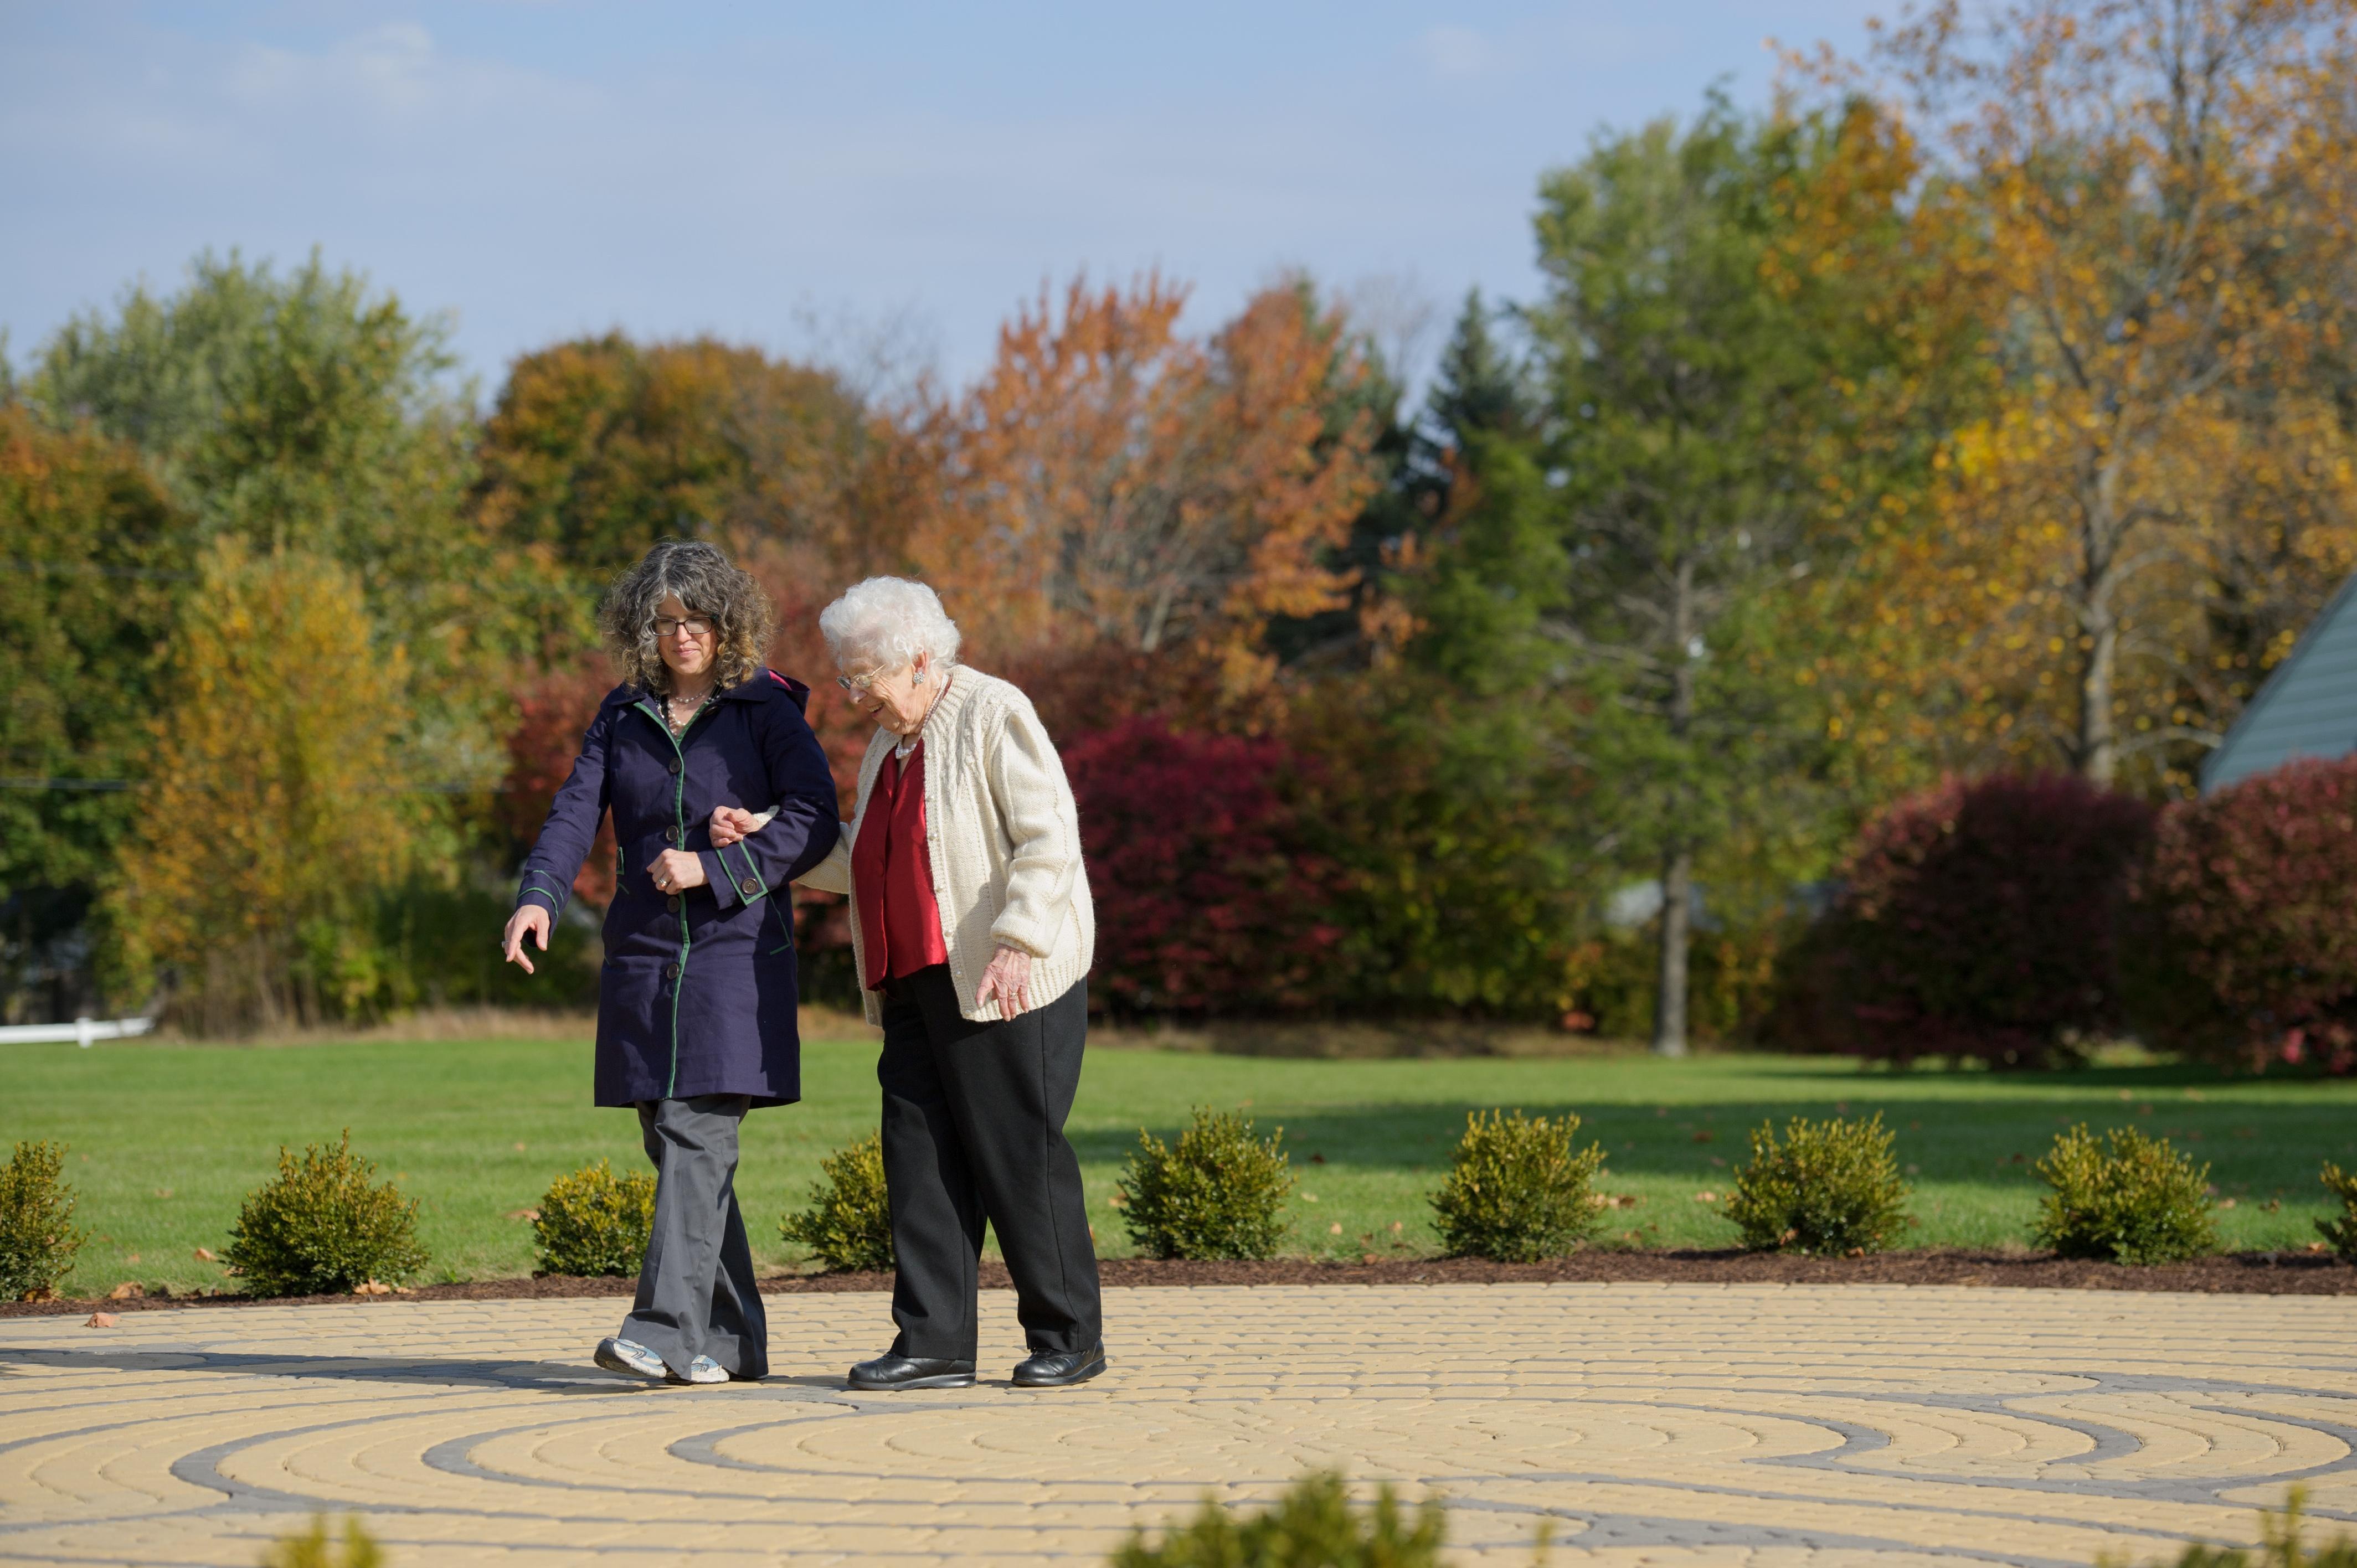 Fall Walks with Seniors